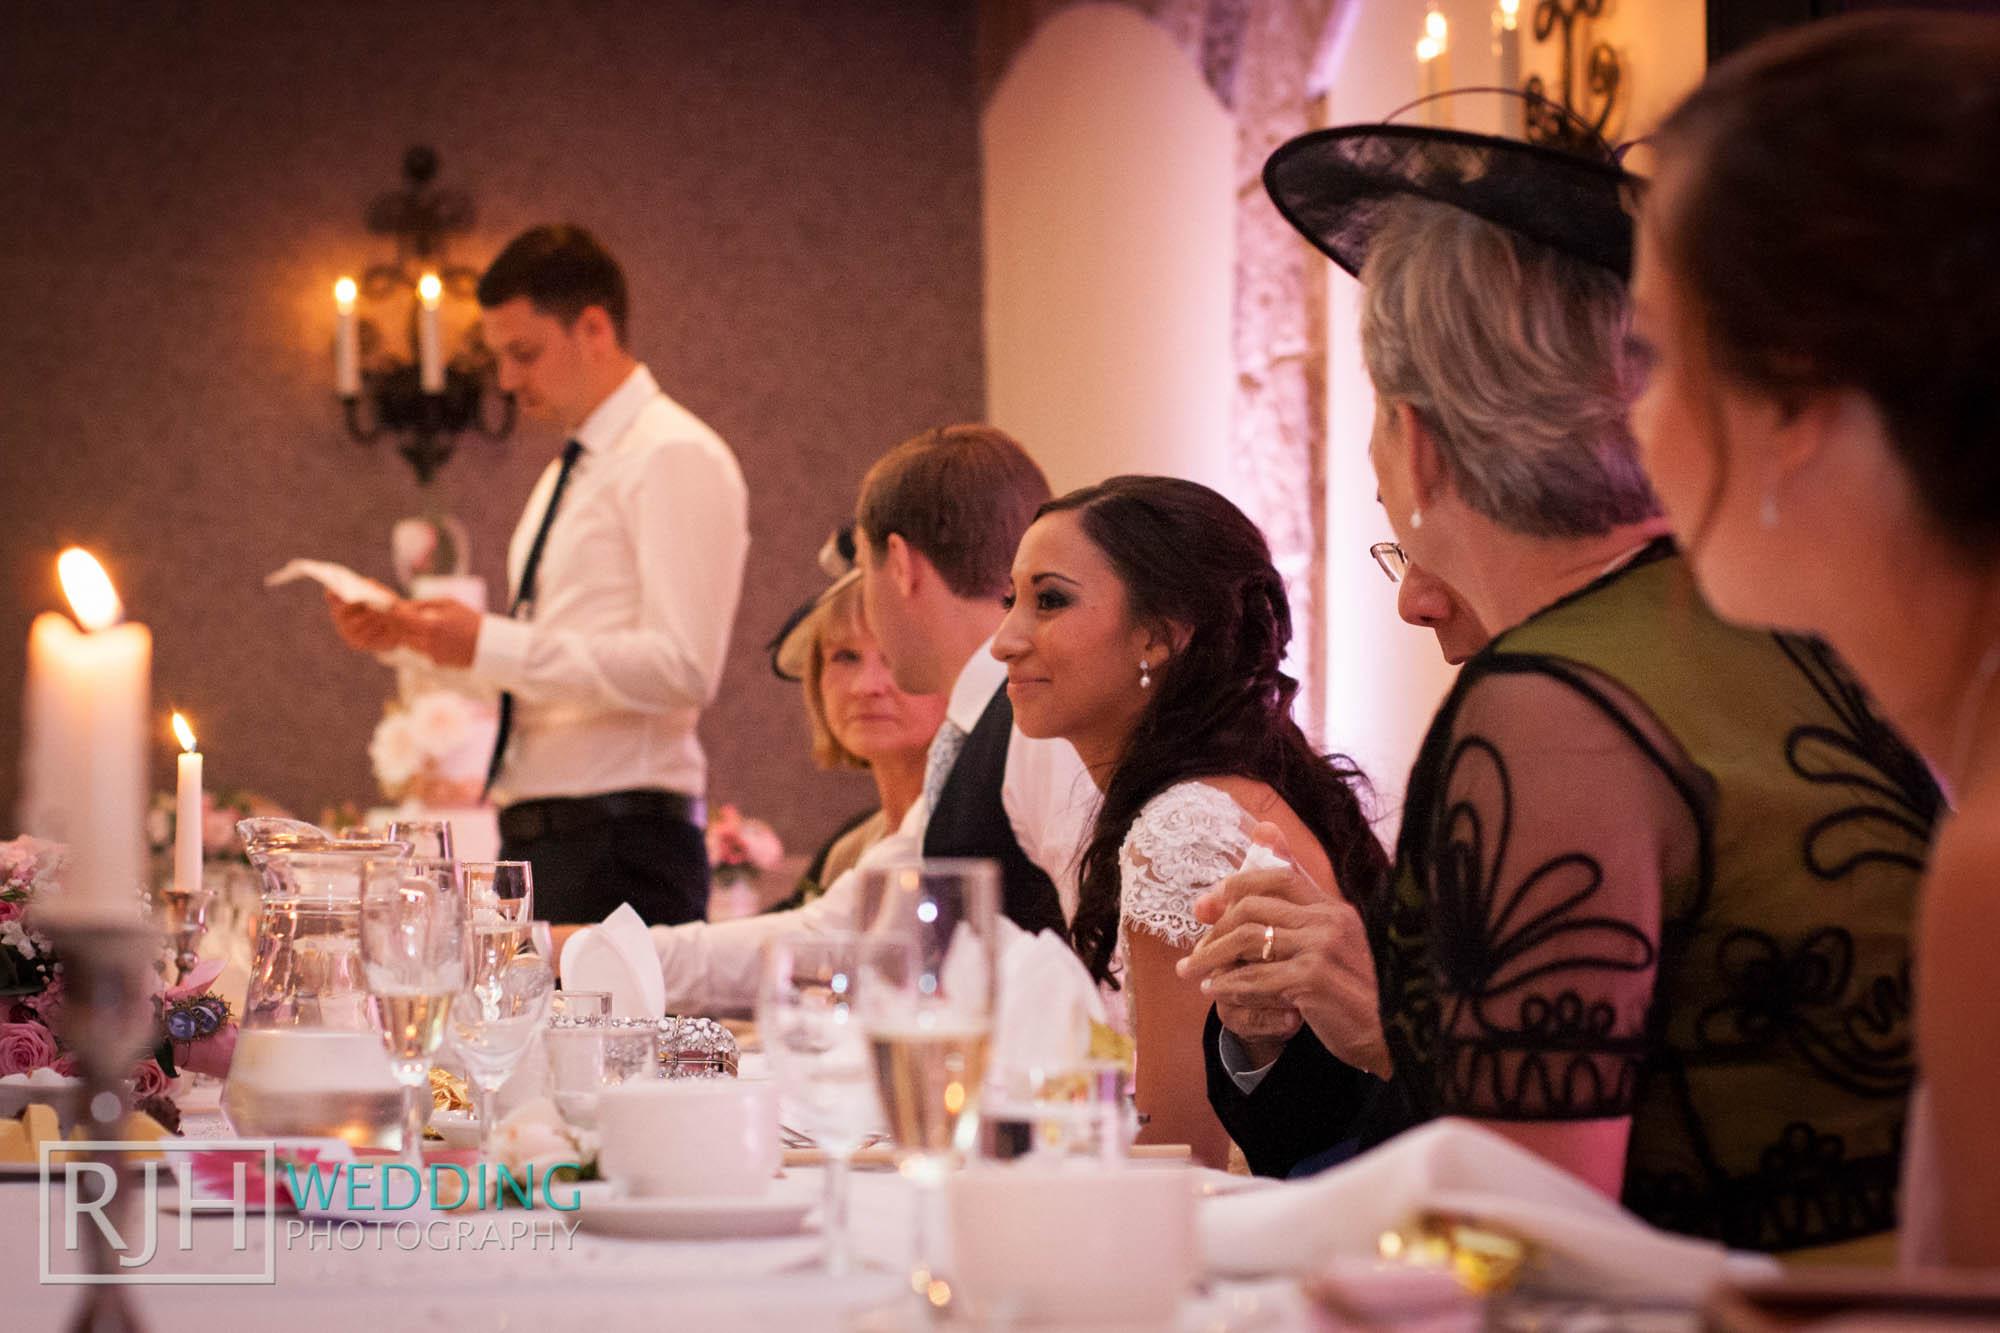 RJH Wedding Photography_Tankersley Manor Wedding_52.jpg